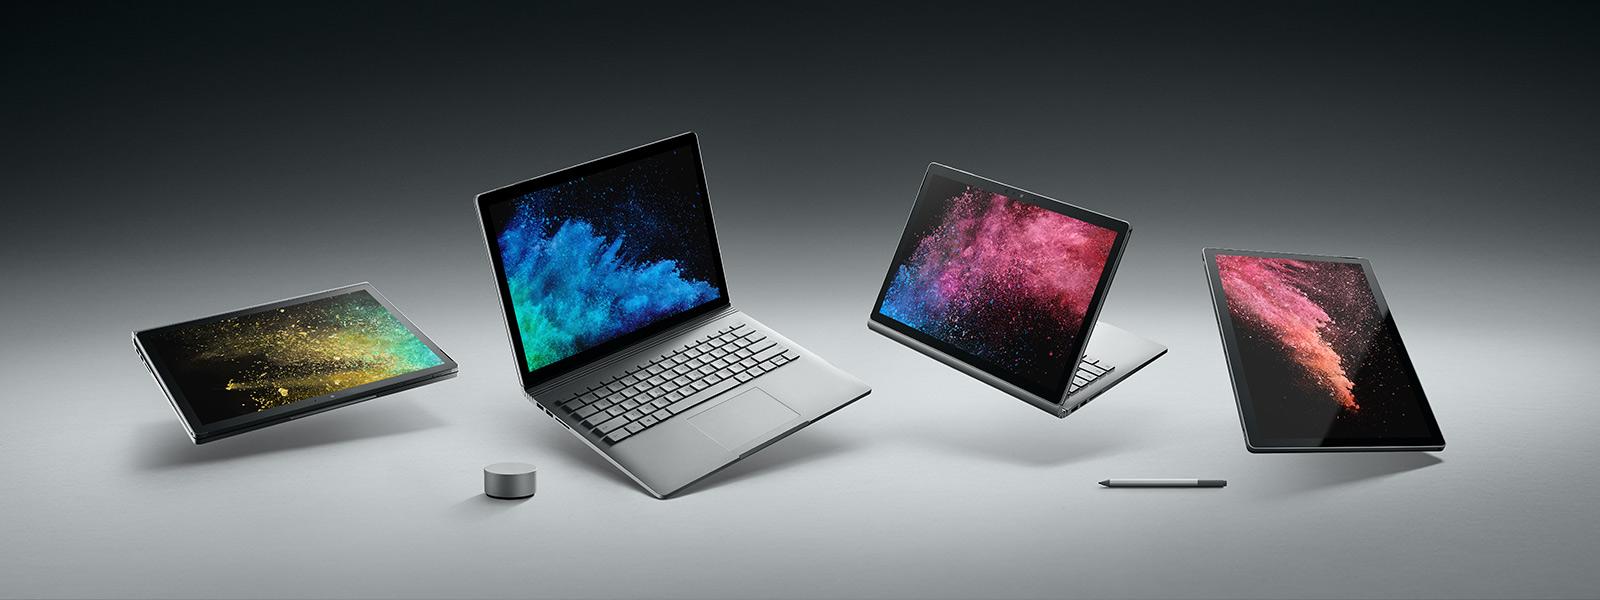 Surface Book 2 以不同模式呈現,還有 Surface Dial 和 Surface 手寫筆。